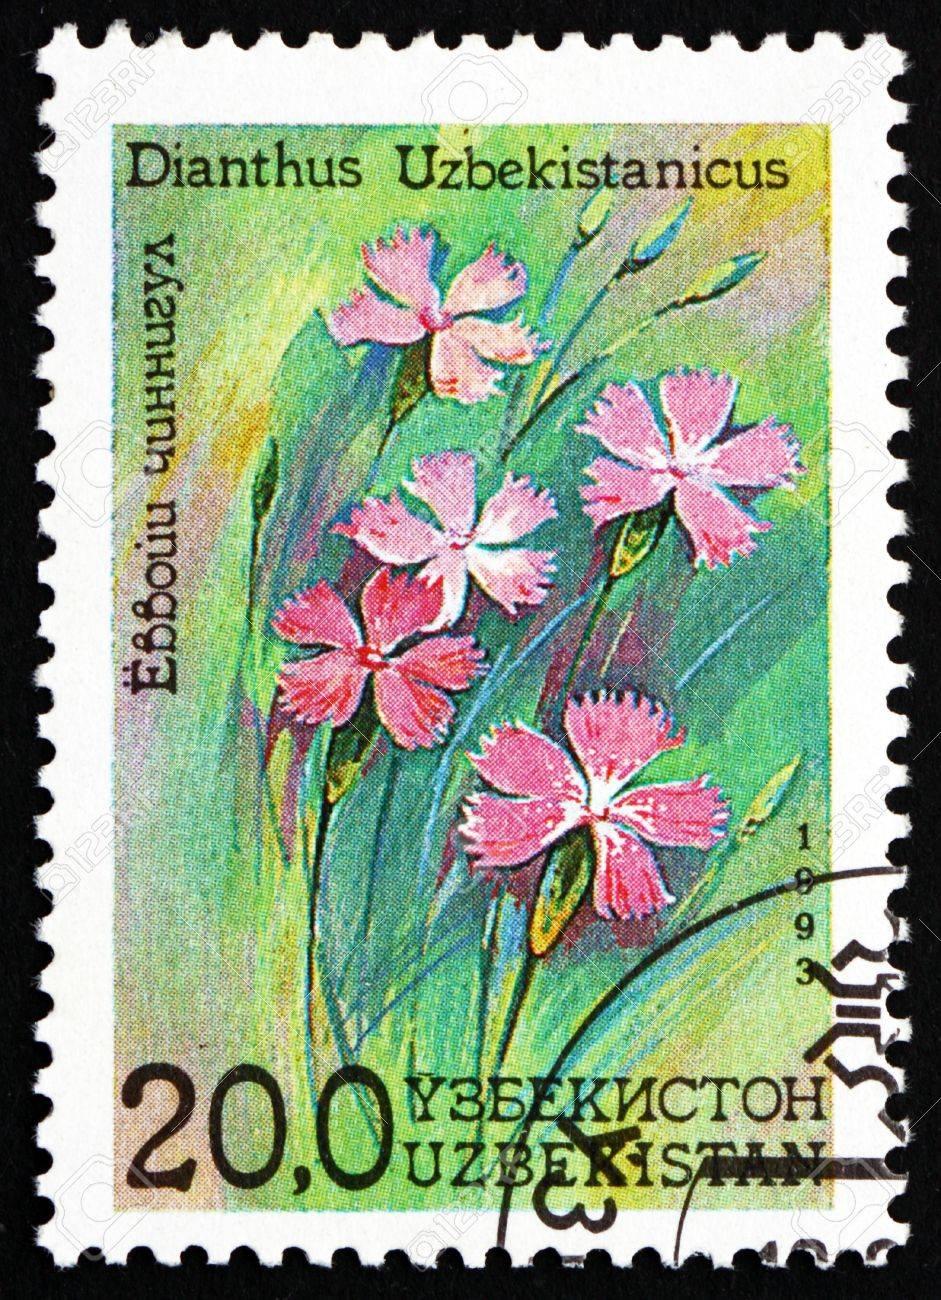 UZBEKISTAN - CIRCA 1993: a stamp printed in Uzbekistan shows Dianthus, Dianthus Uzbekistanicus, Flower, circa 1993 Stock Photo - 17145066